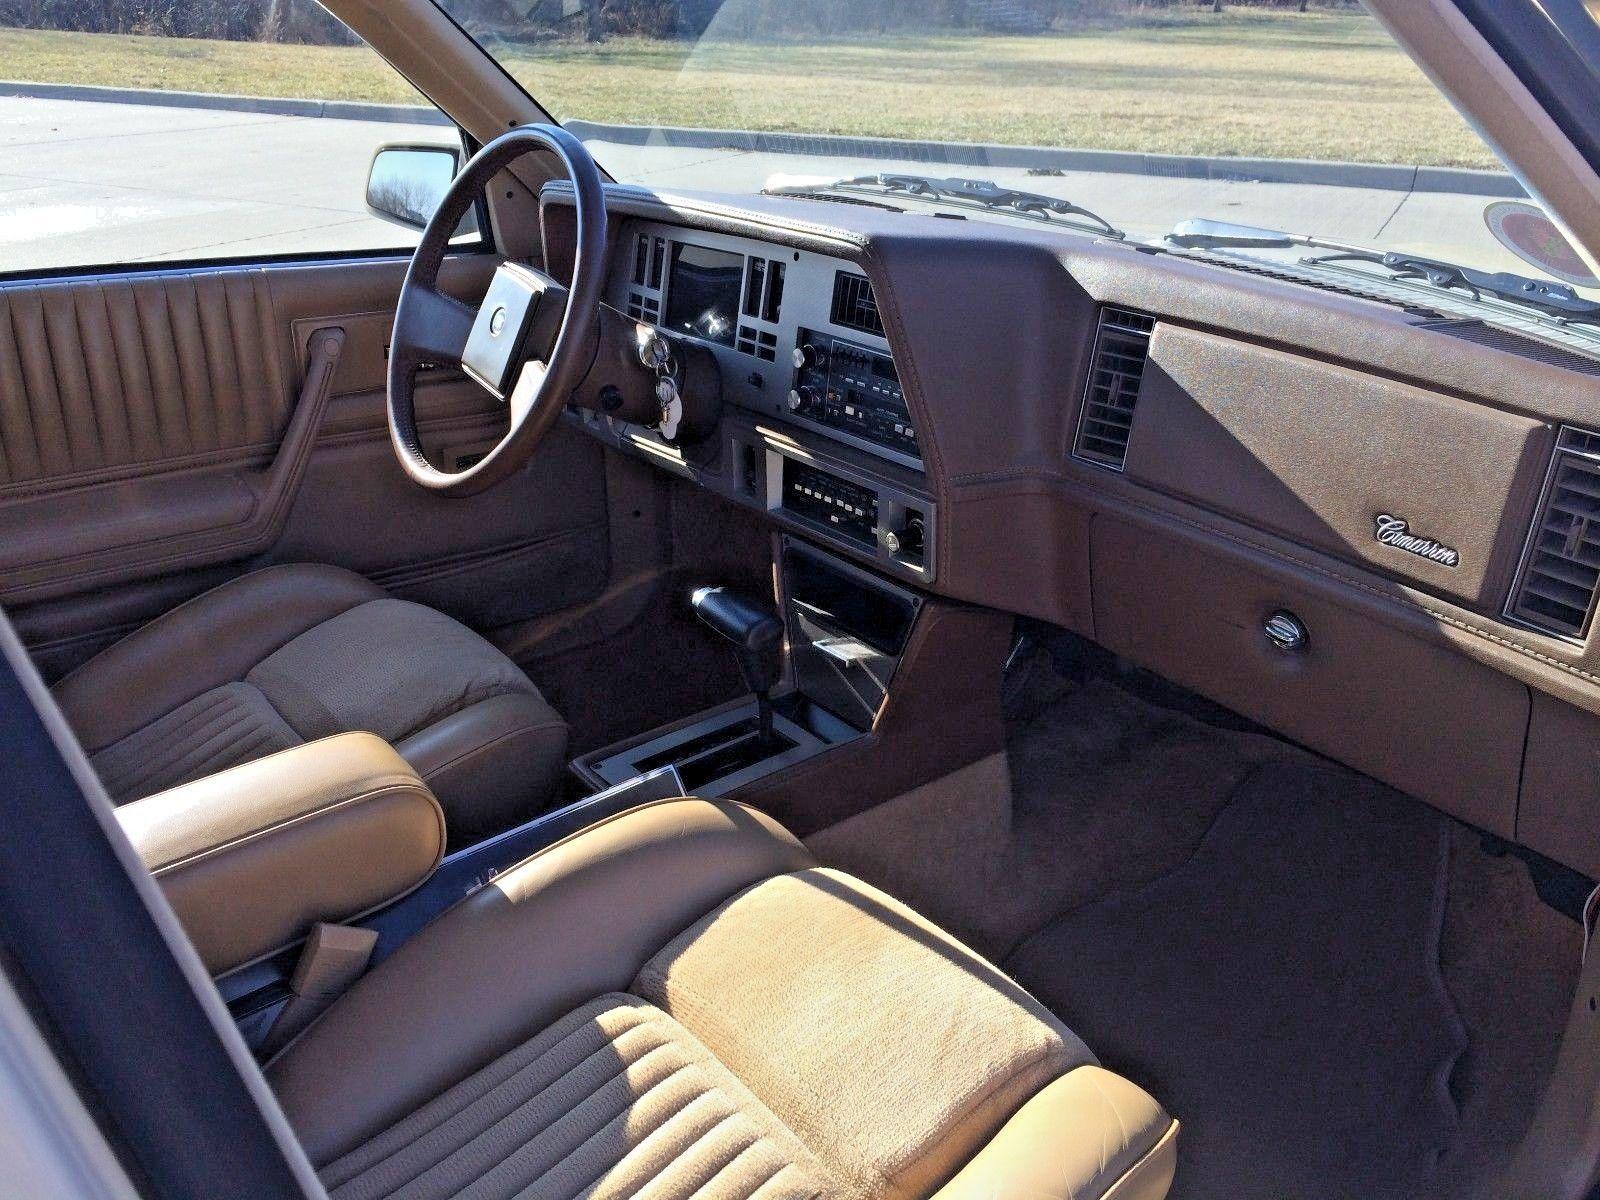 1985 Cadillac Cimarron front seat